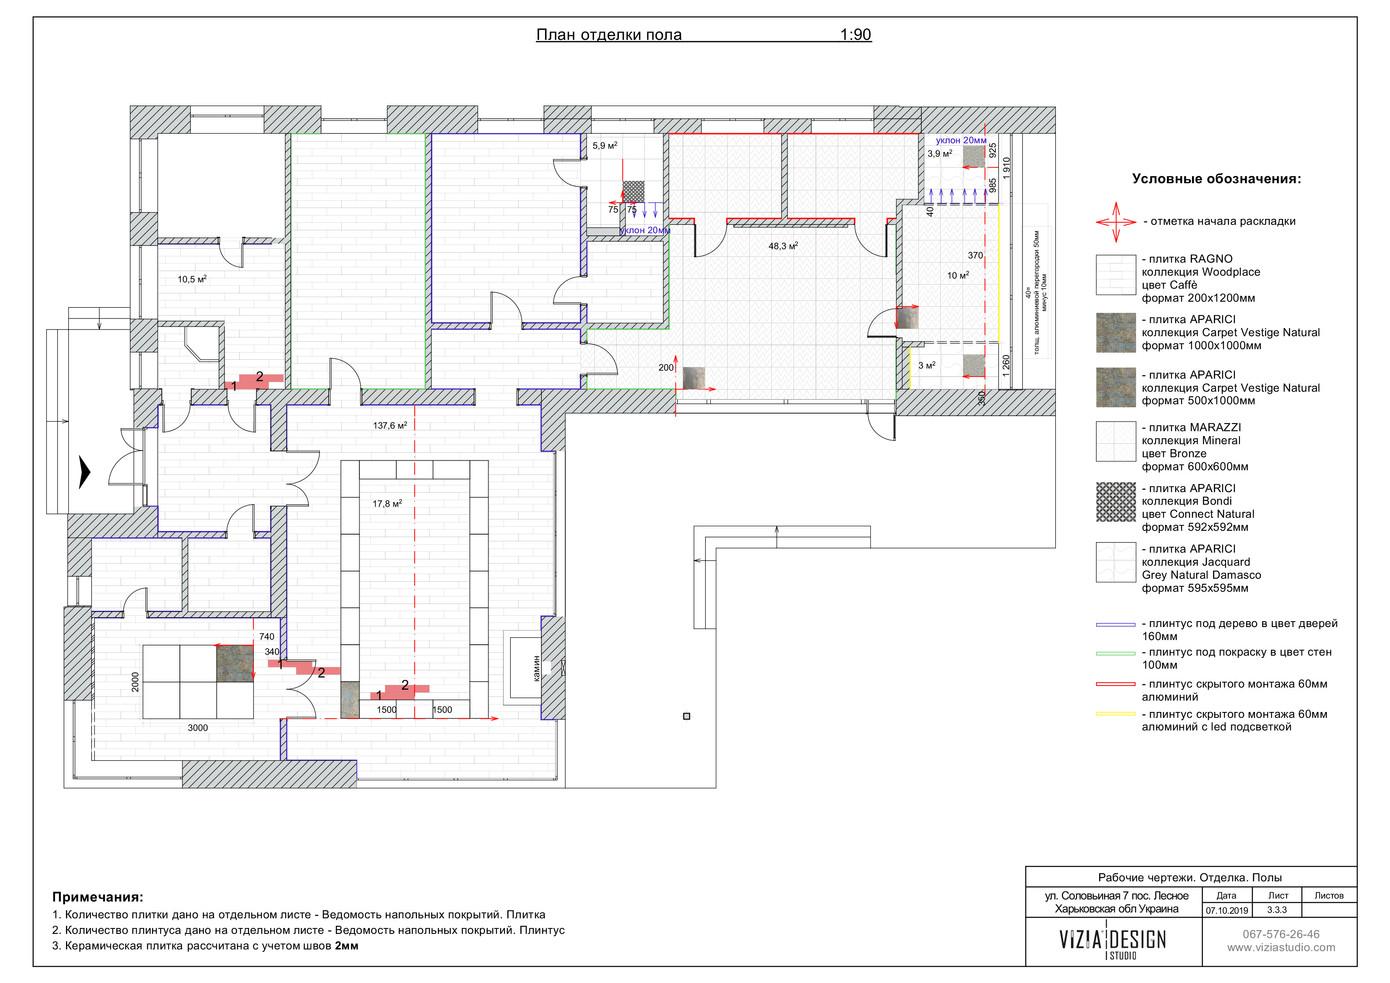 floor finishing plan.jpg